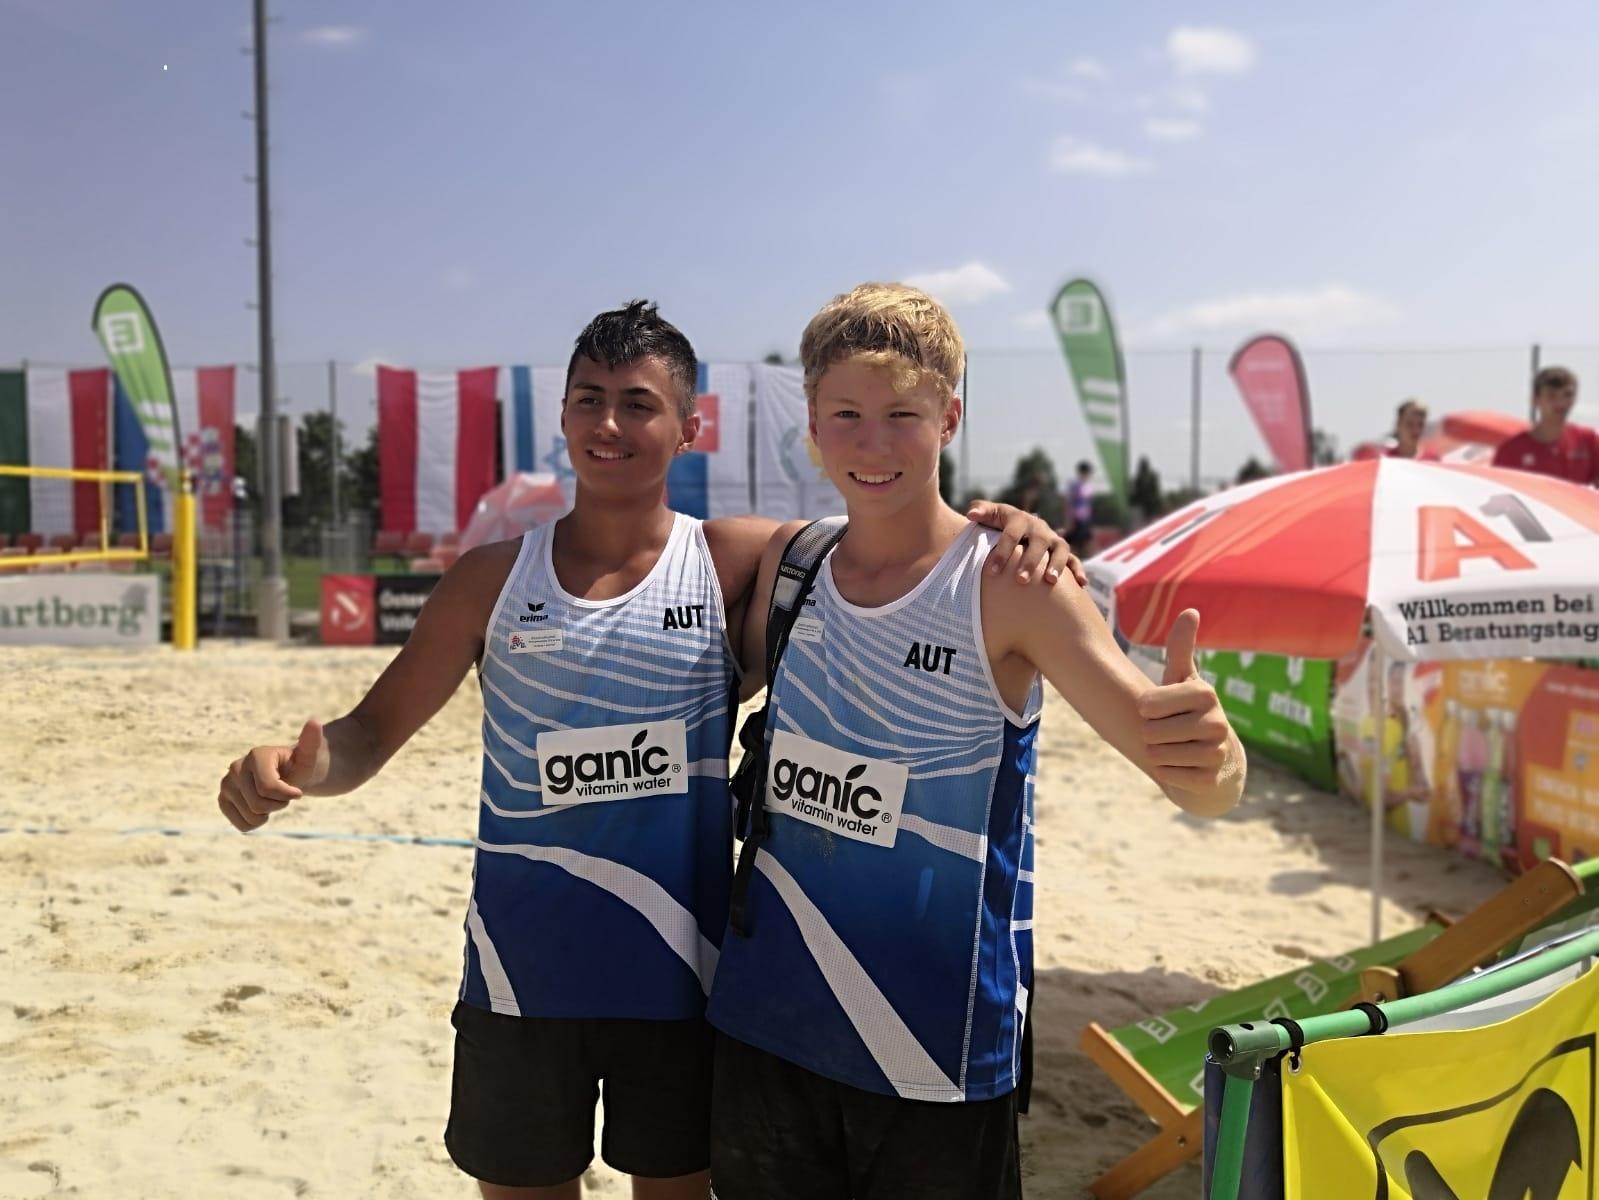 Sensationeller Erfolg bei MEVZA U16/U18 Beach-Championships